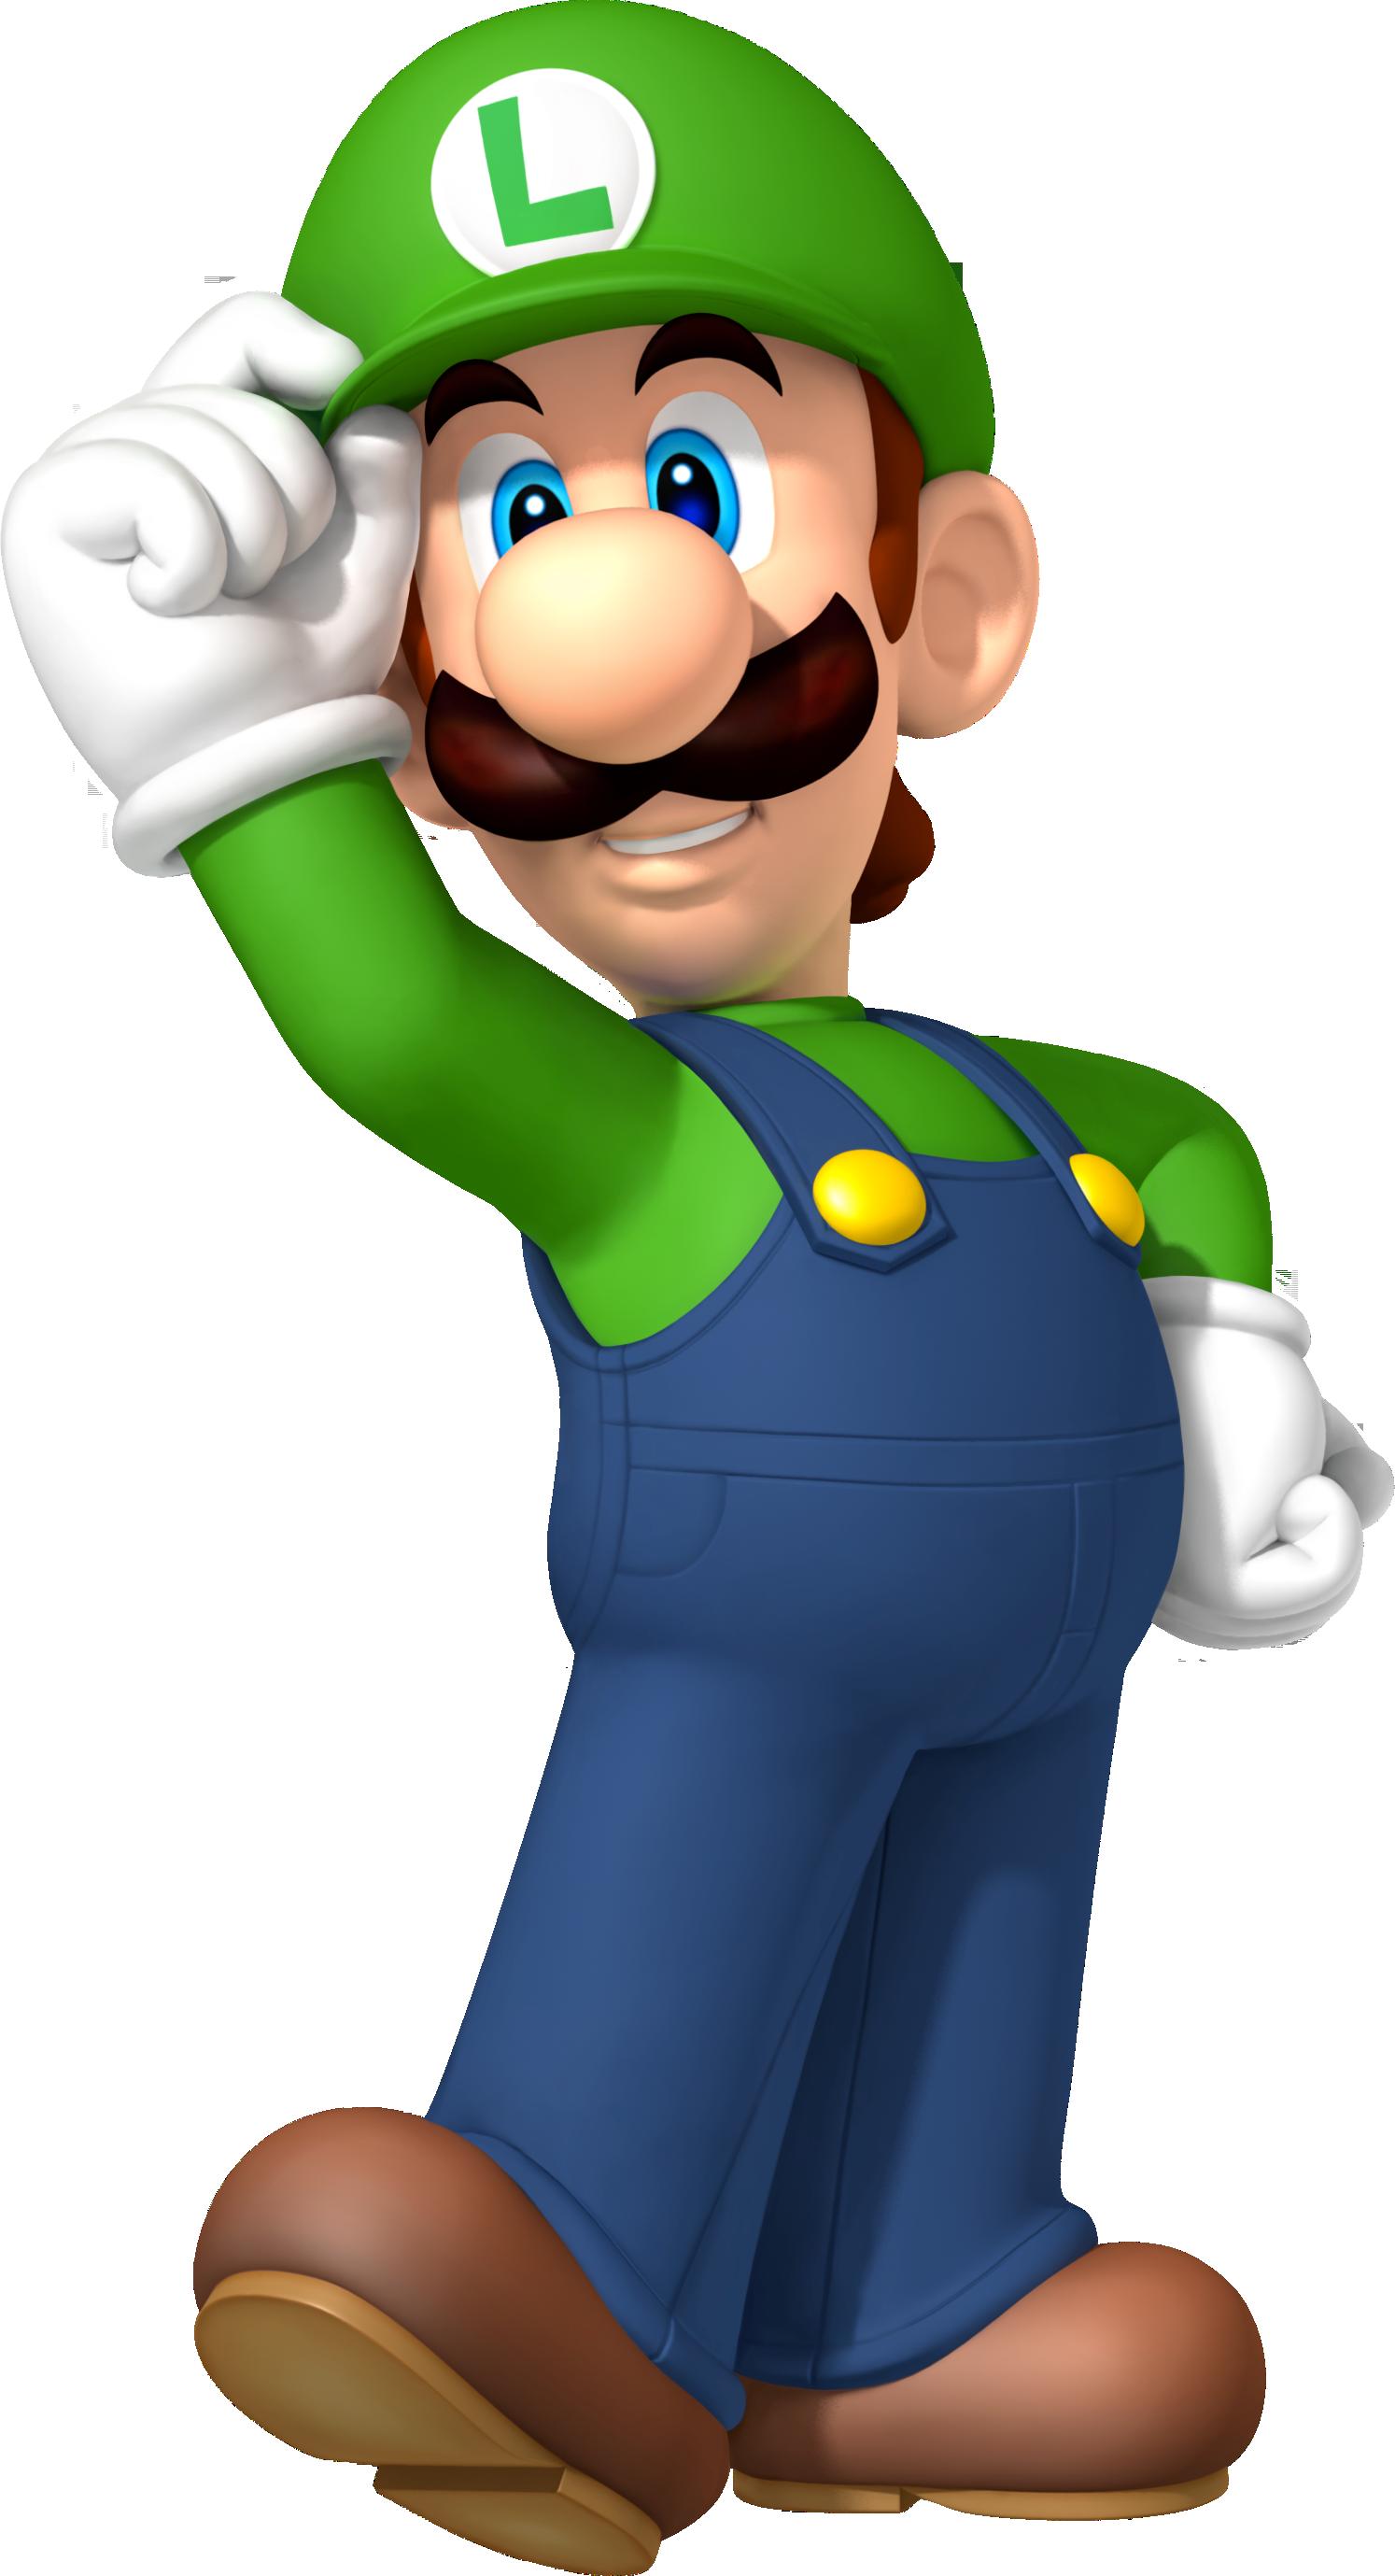 Gallery:Luigi - Super Mario Wiki, the Mario